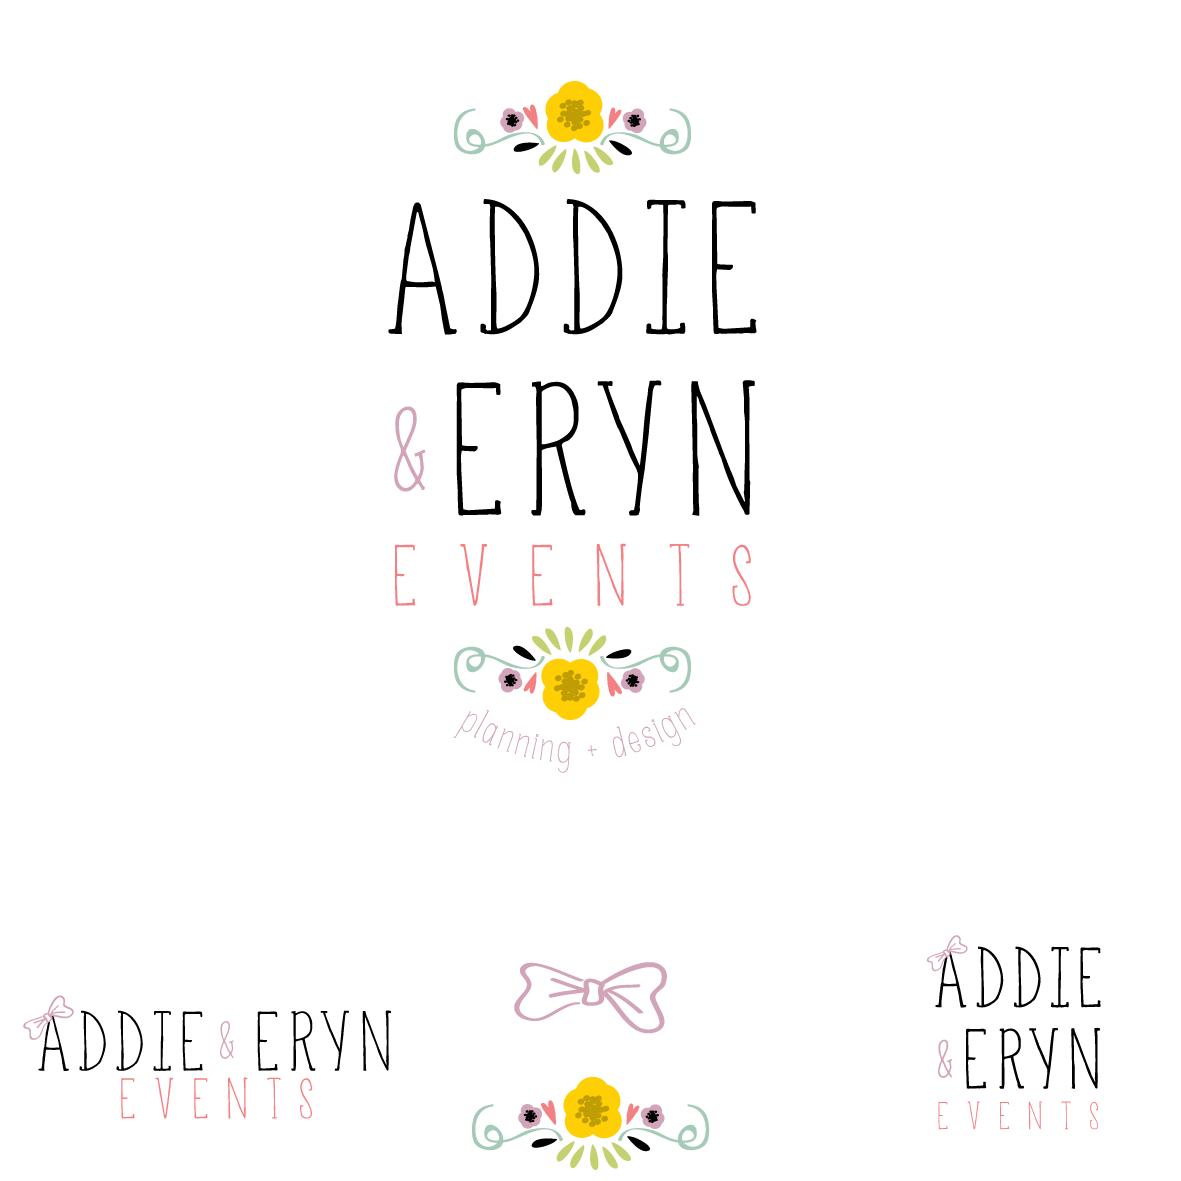 logo for Addie & Eryn Events